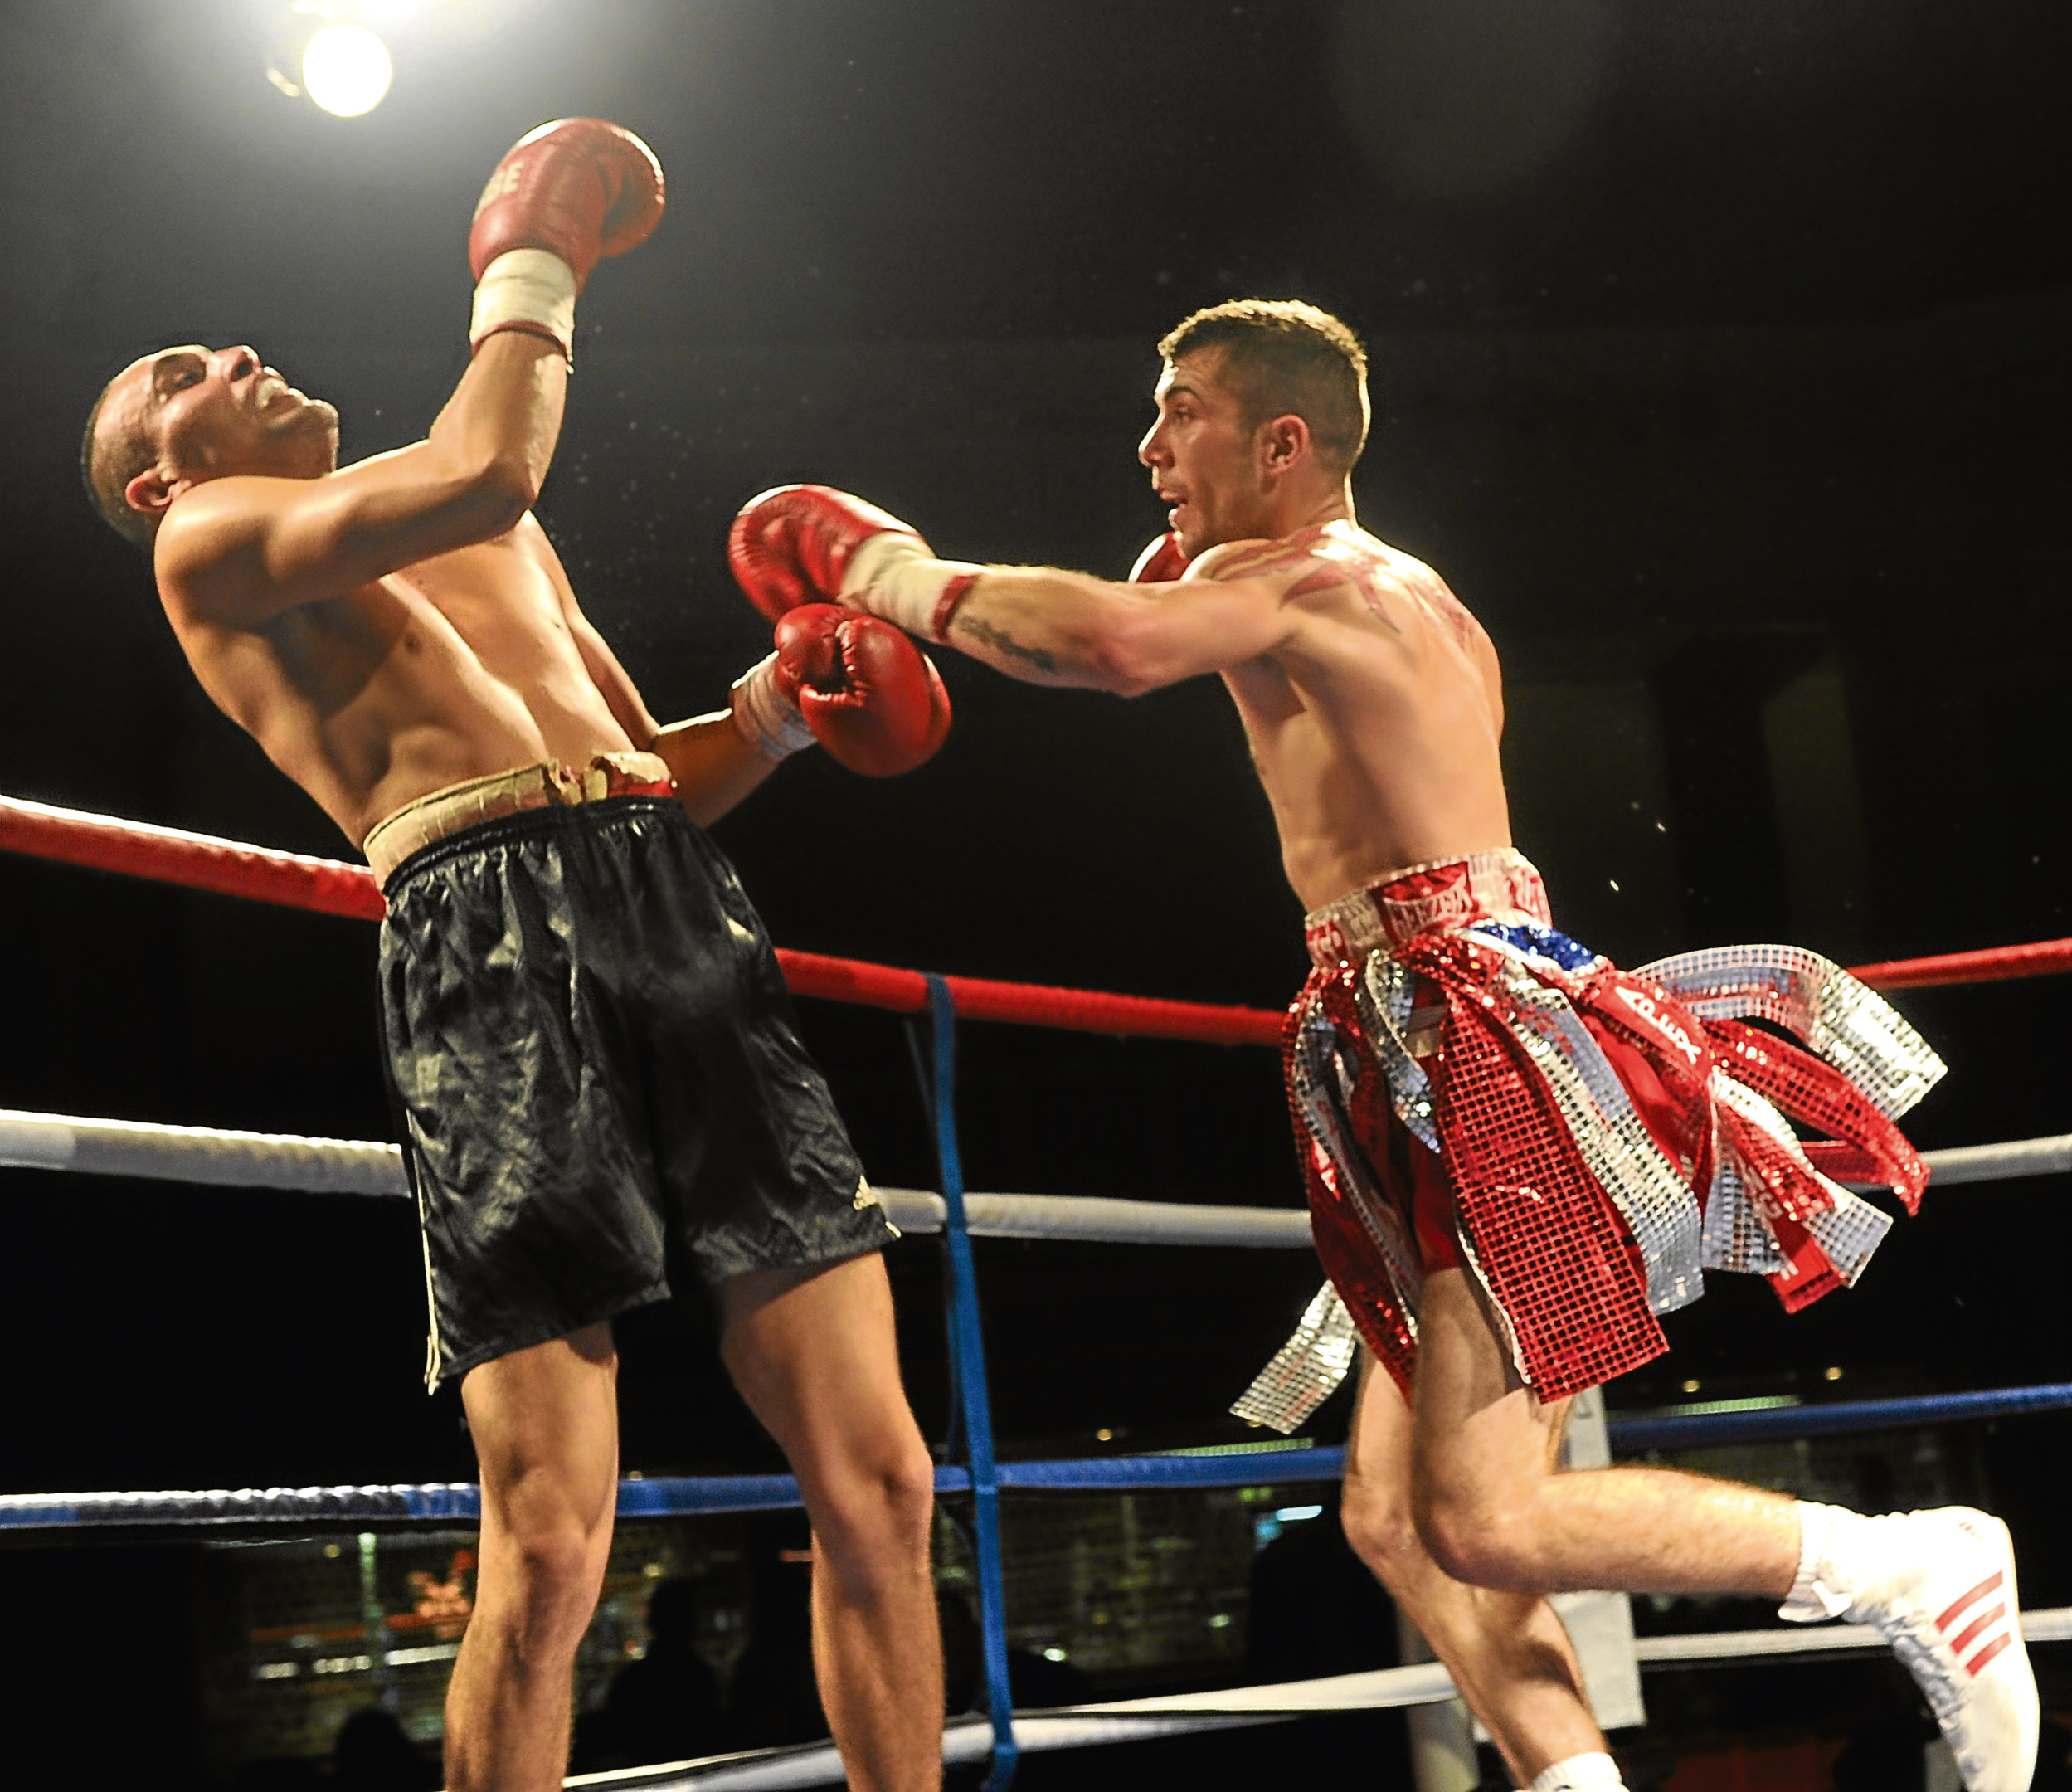 Lee McAllister on his way to beat  Karoly Lakatos, Hungary at the Beach Ballroom, Aberdeen.